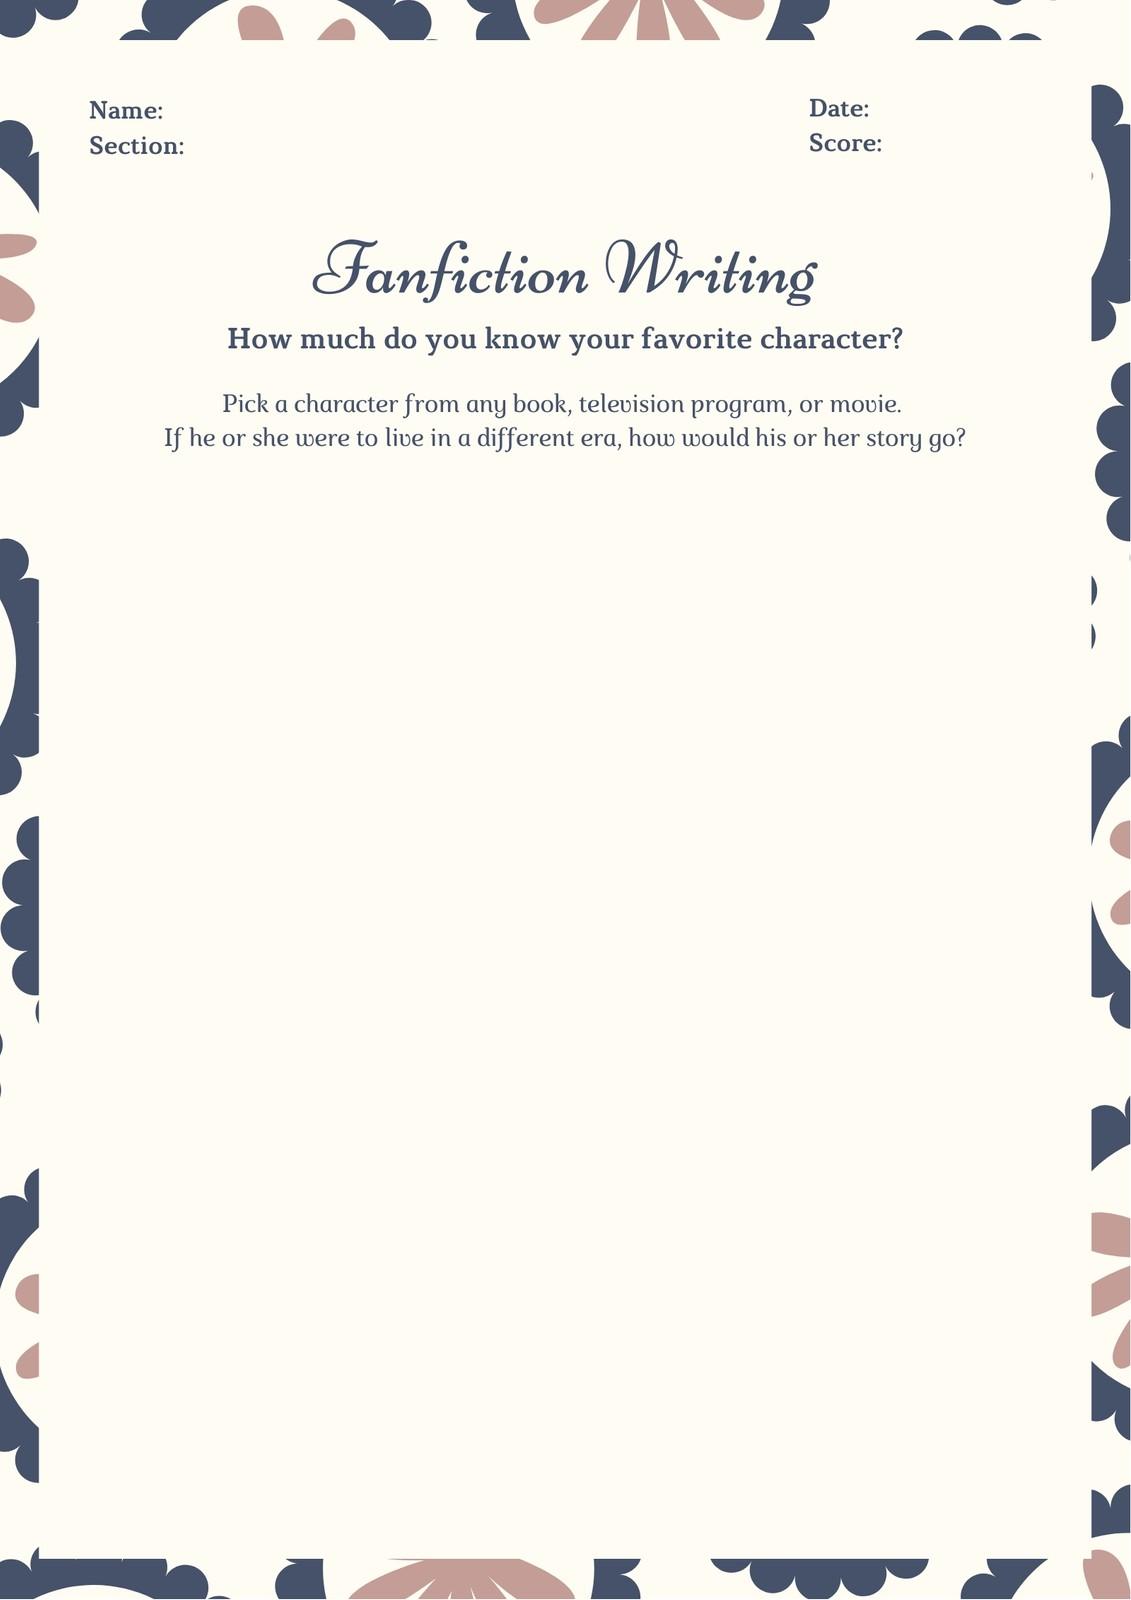 Brown Blue Floral Fanfiction Writing Prompt Worksheet